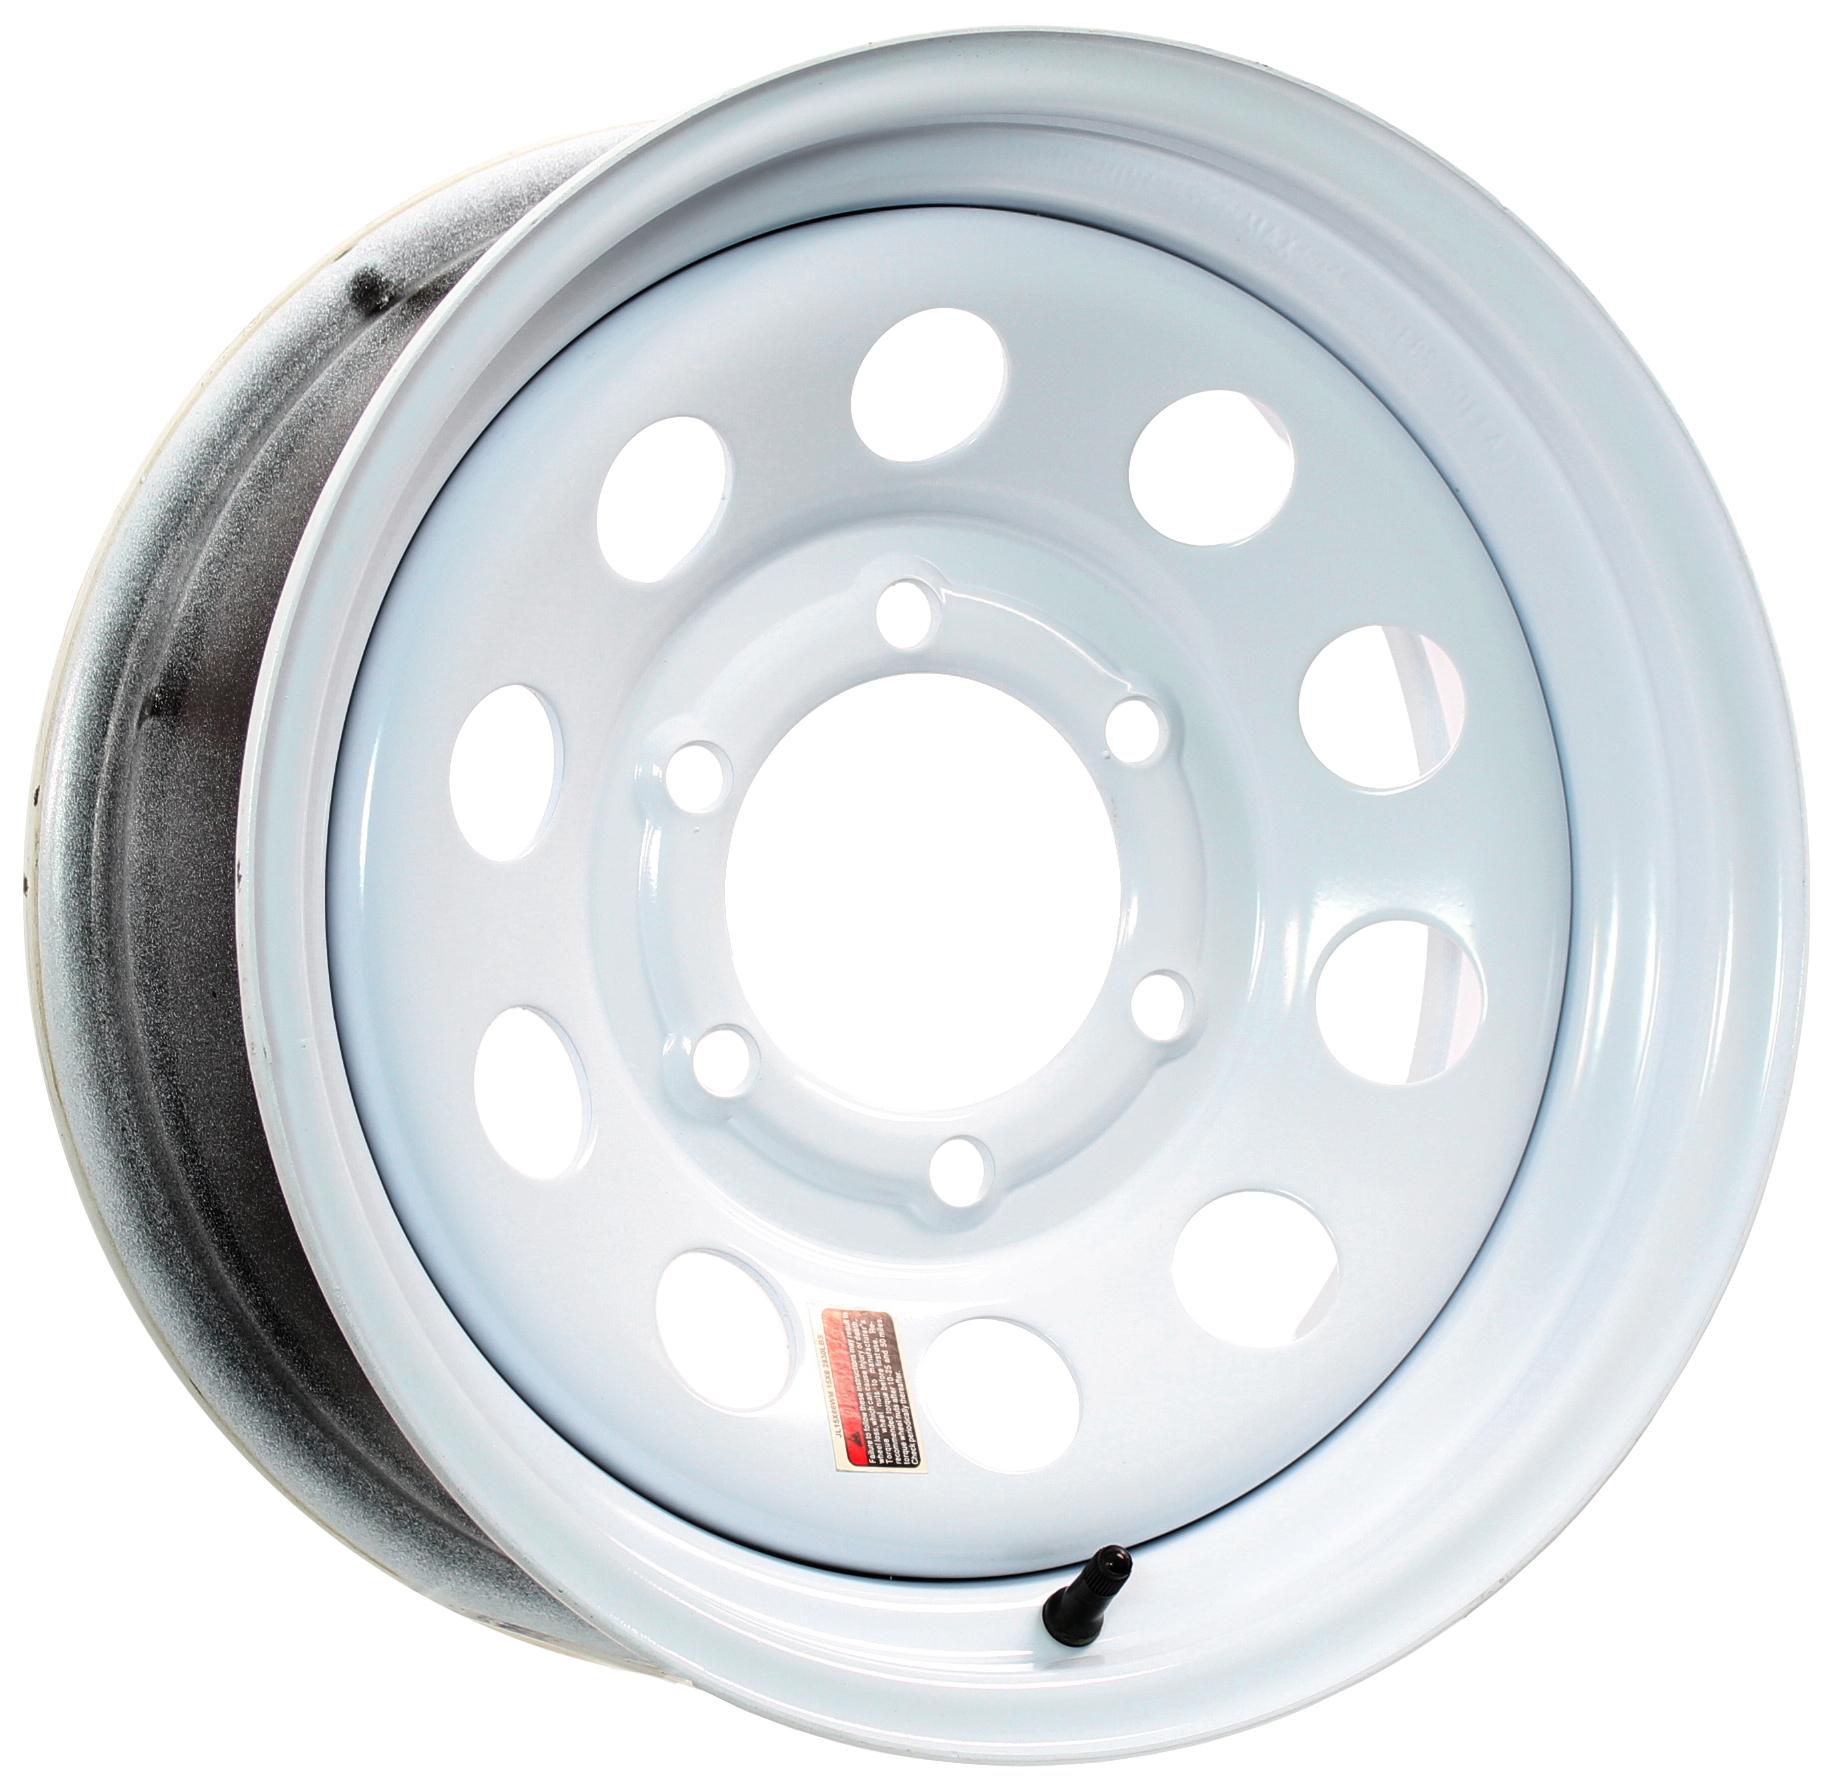 15x6 6-Lug White Mod Steel Trailer Wheel Image